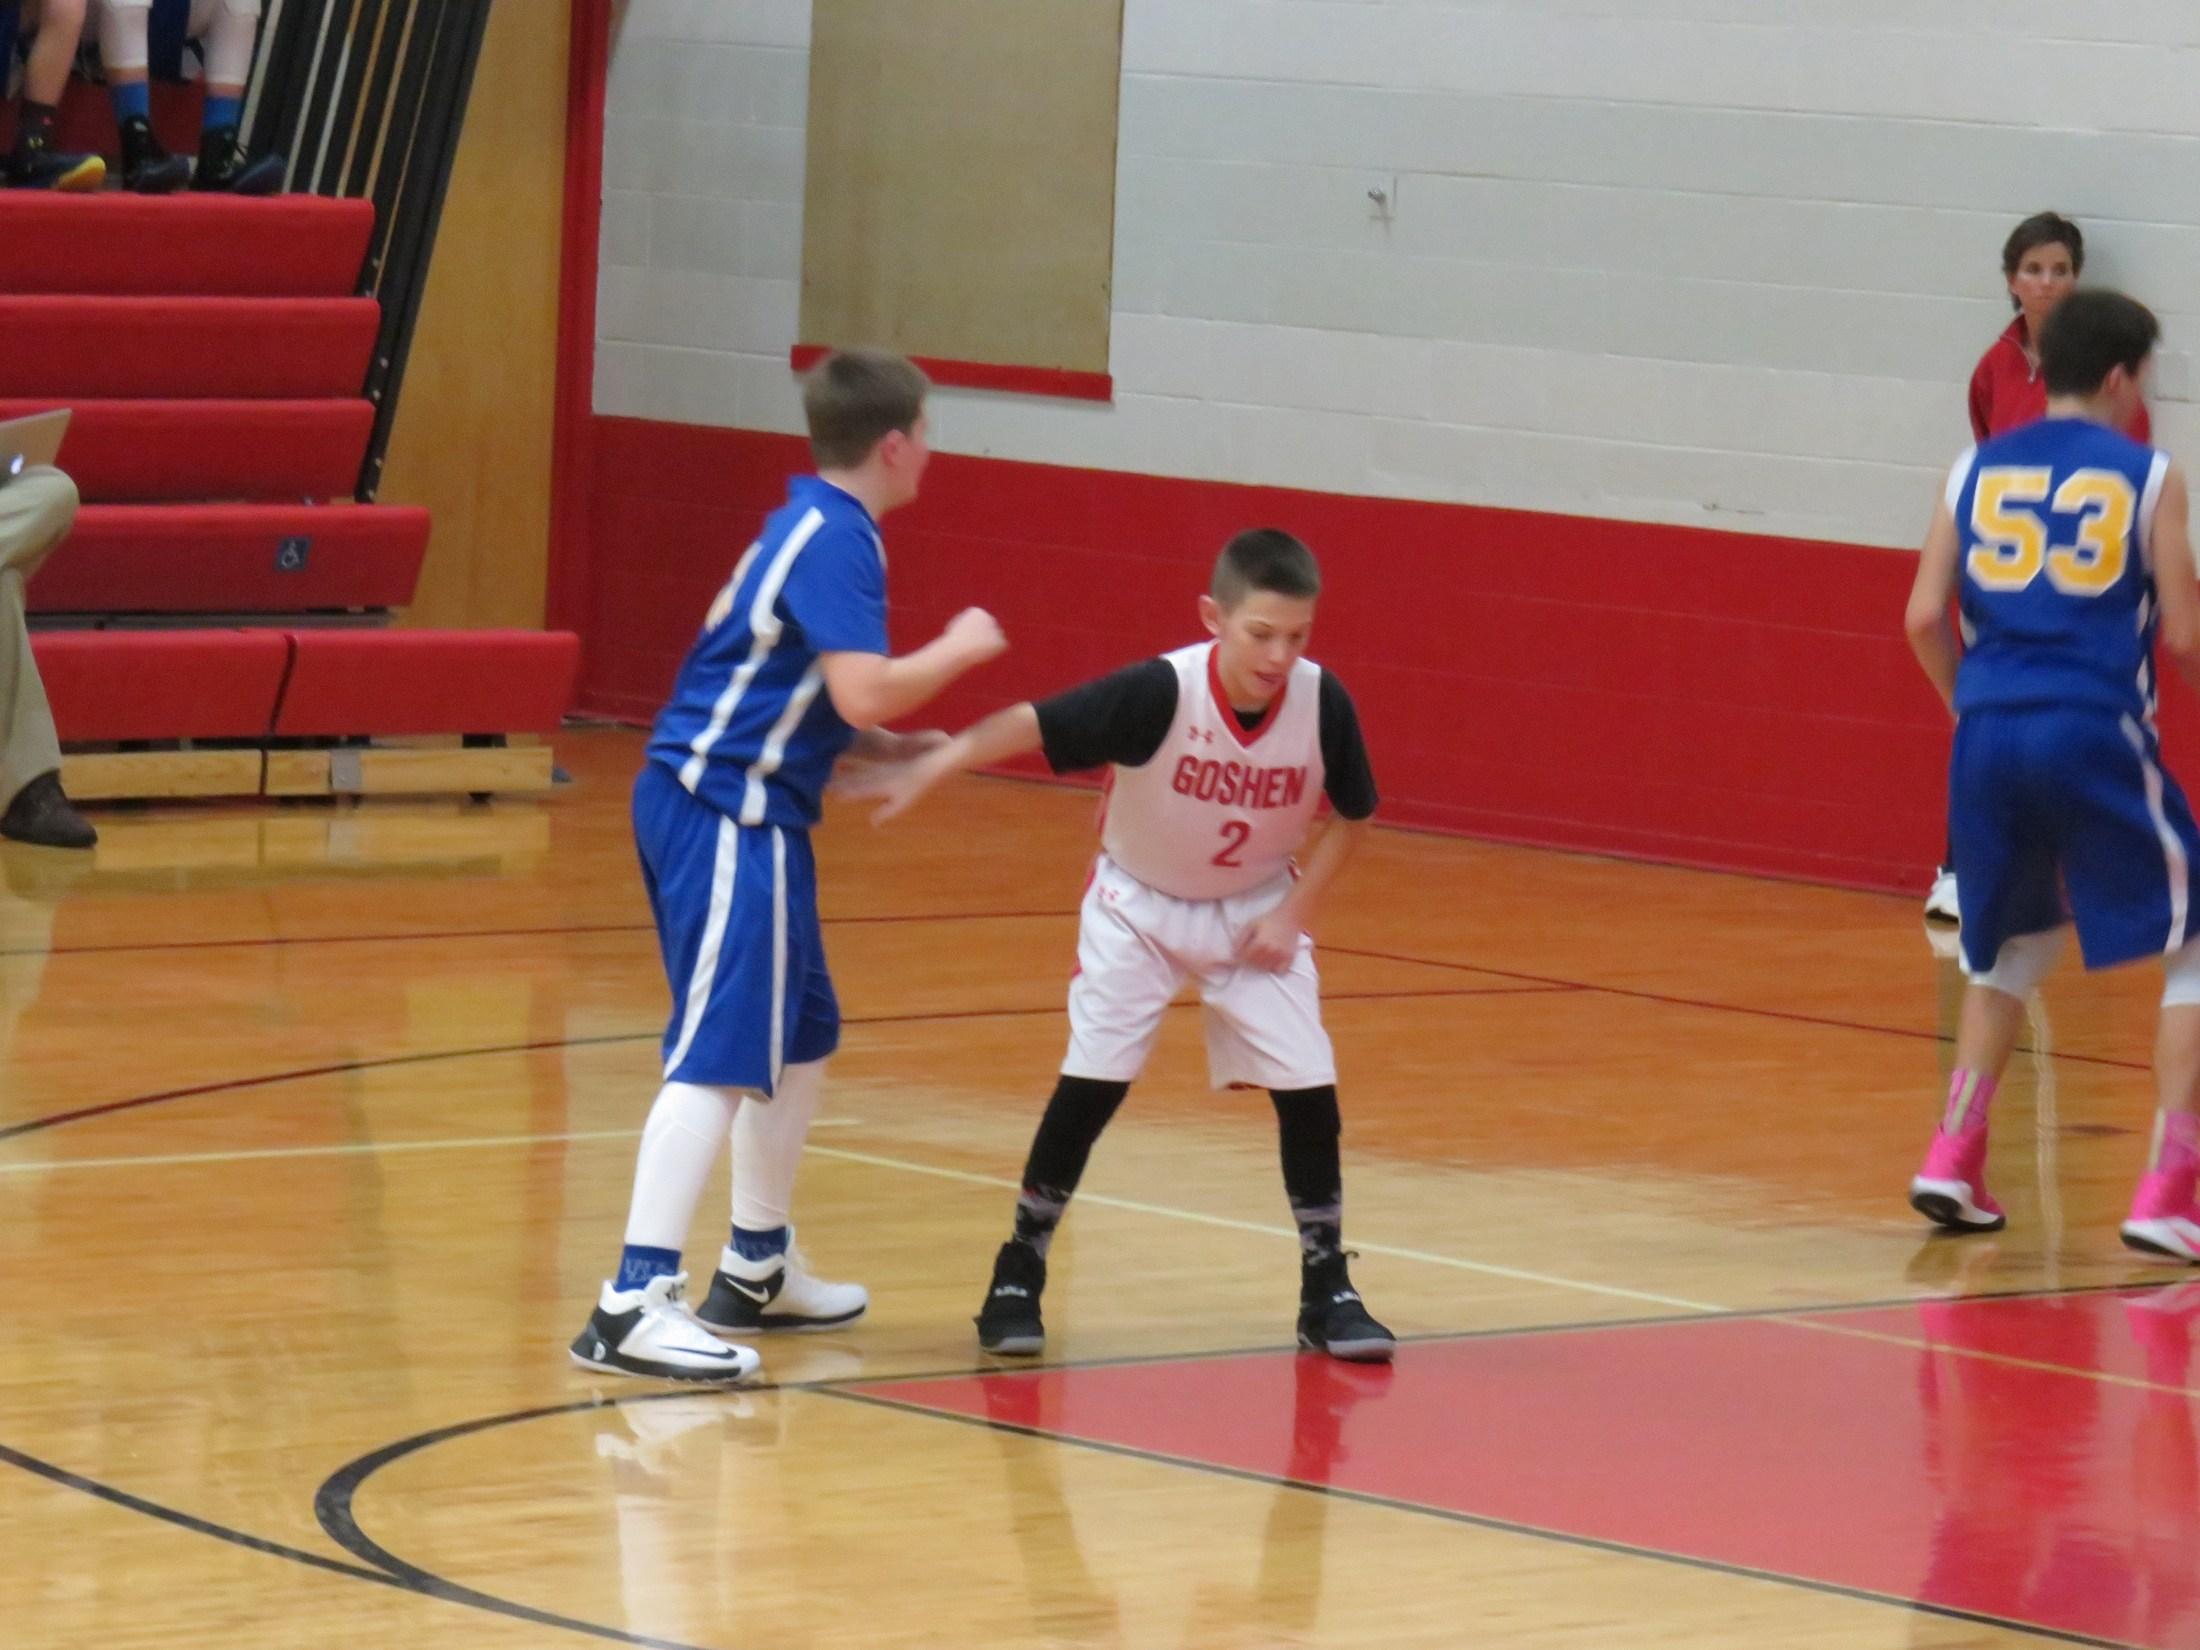 7th grade boys basketball player Steven Beckstedt